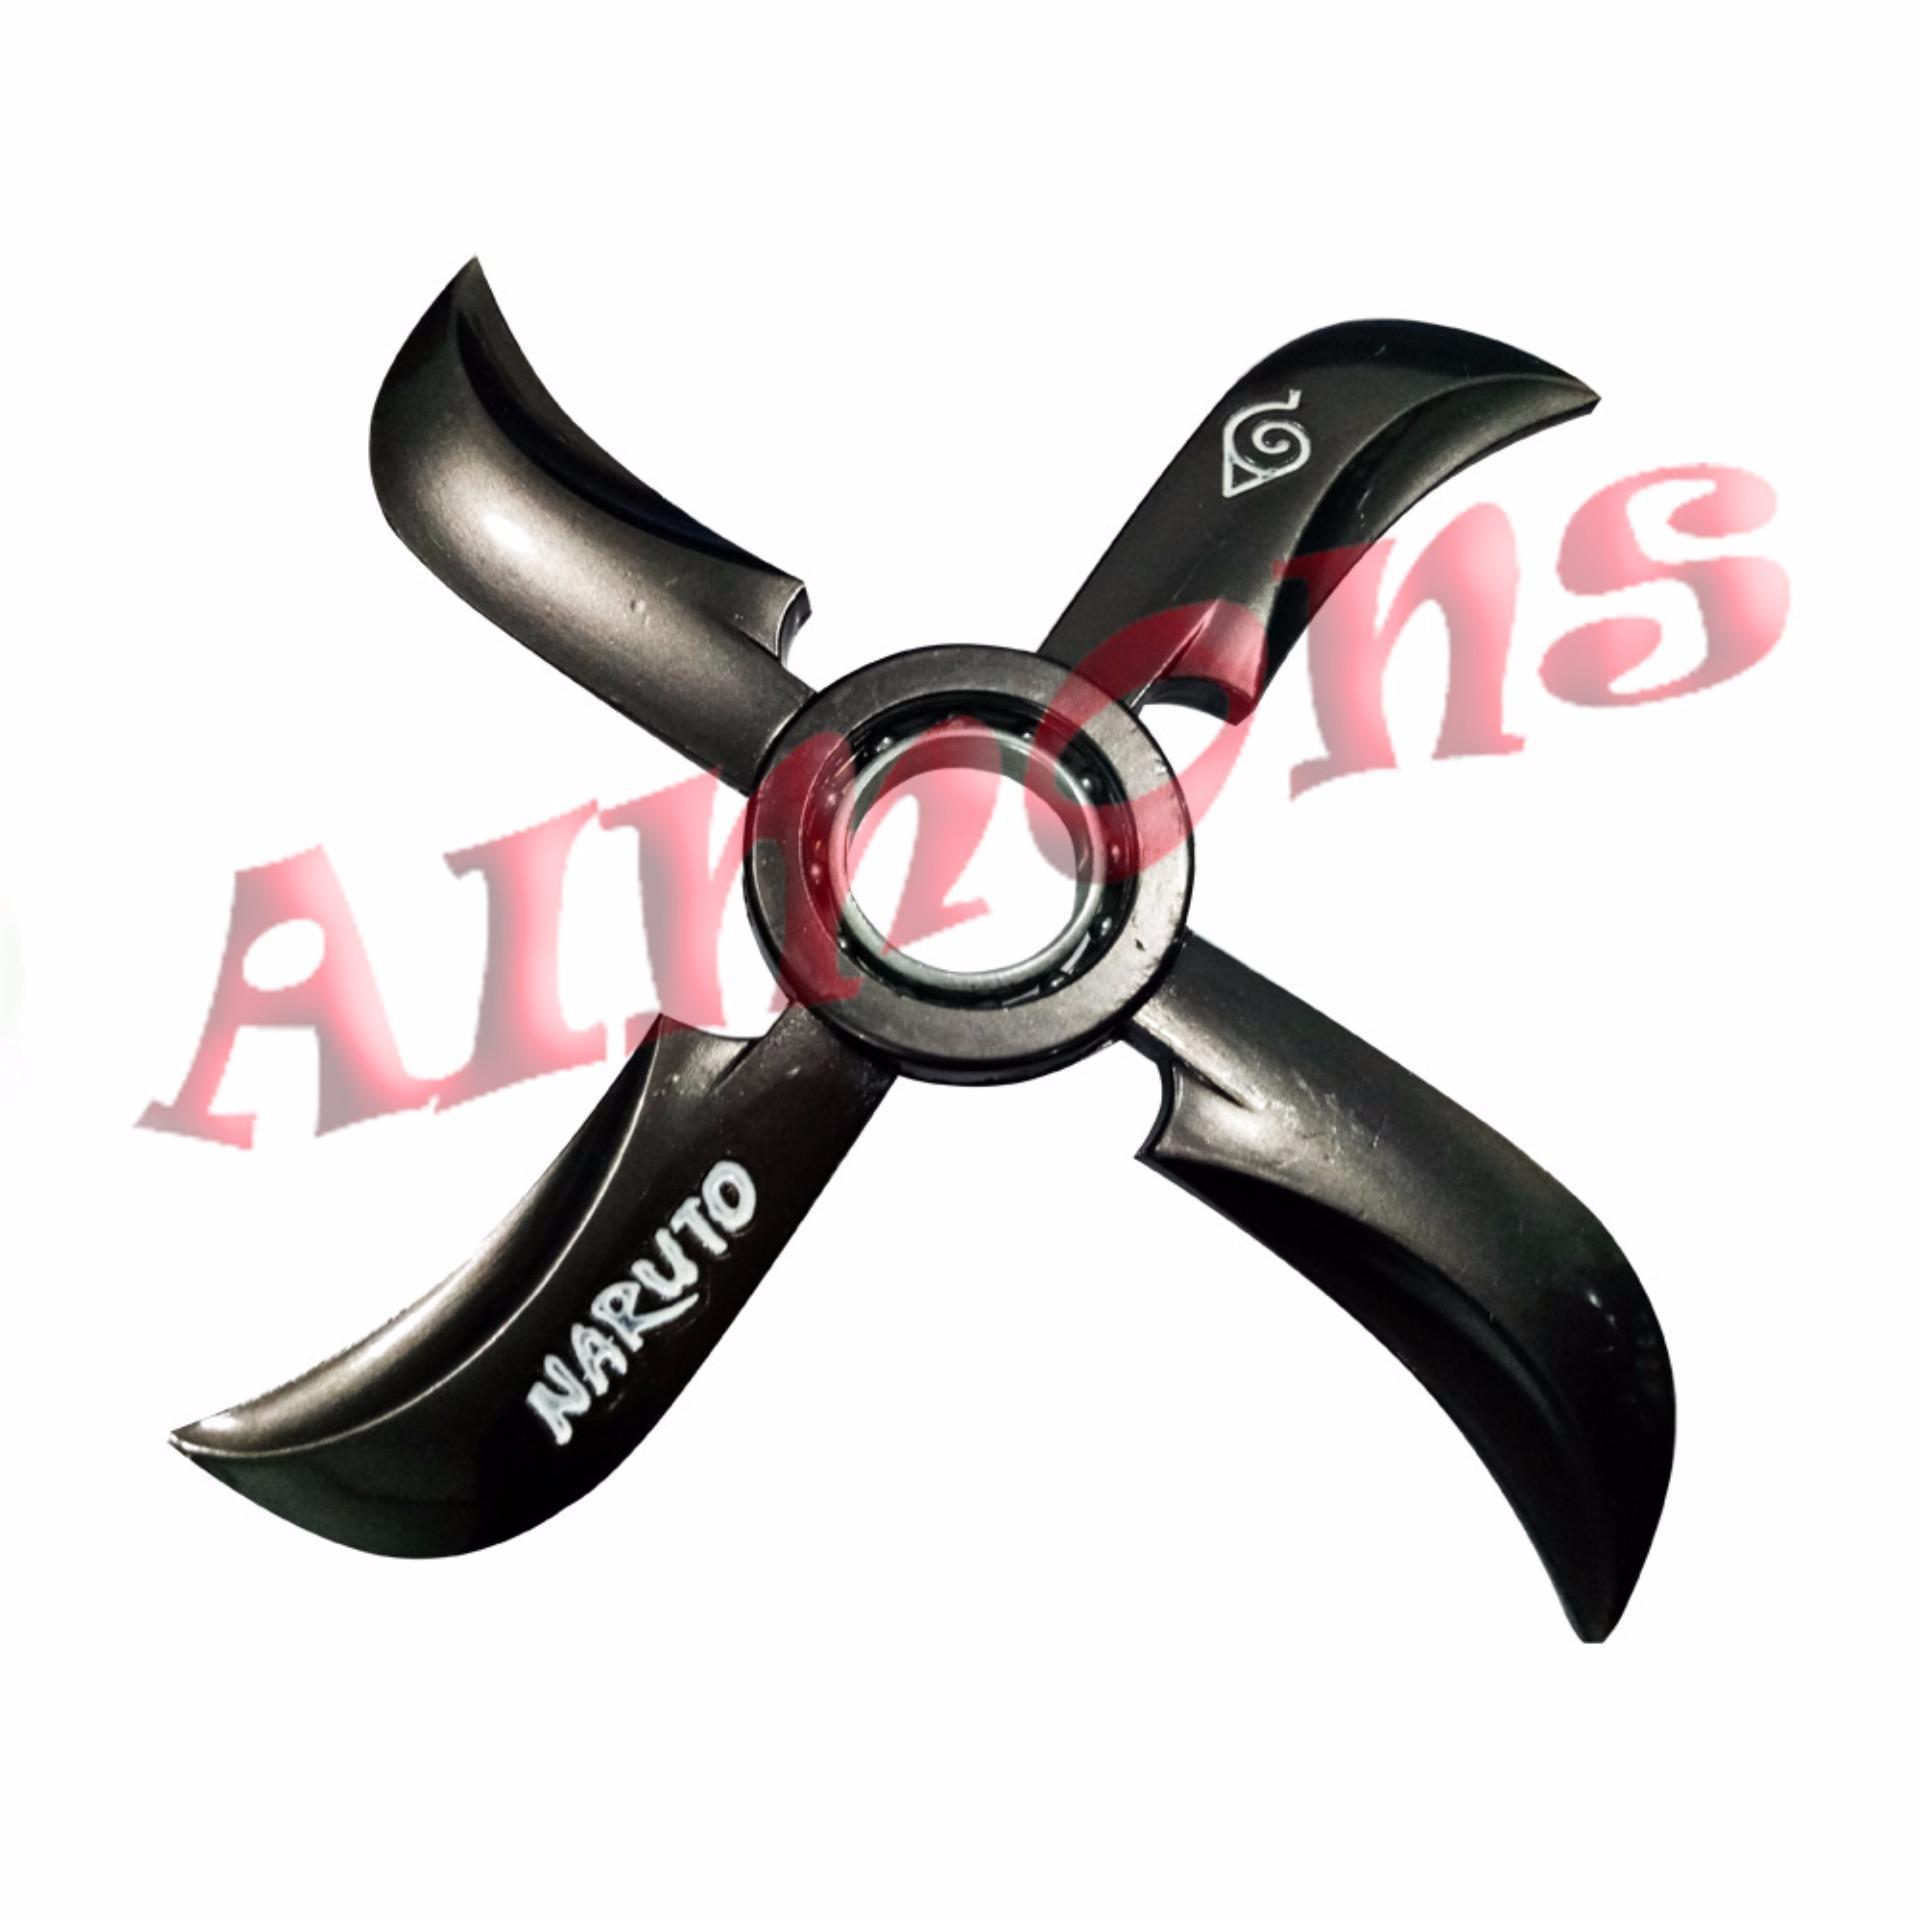 ... Hand Toys Focus Games / Mainan Spiner Aimons Fidget Spinner Naruto Spiner Jari Shuriken - Shuriken 4 Pedang